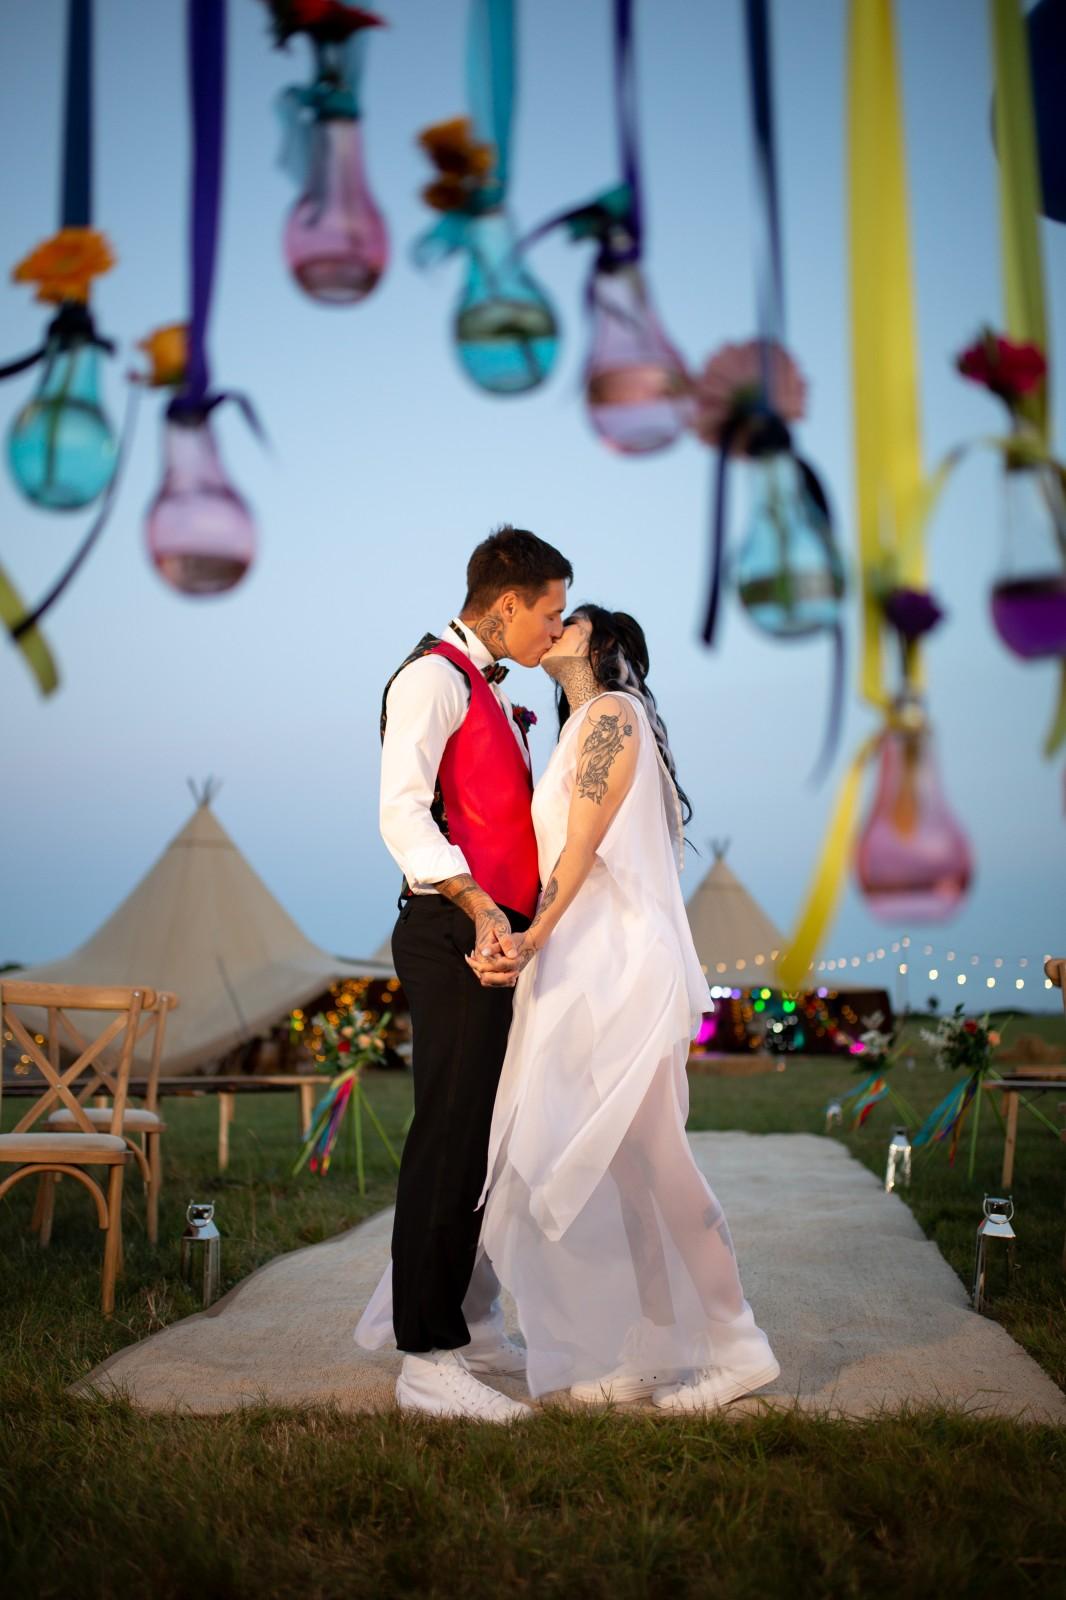 rainbow festival wedding - colourful wedding - quirky wedding ideas - festival wedding ceremony - coloured lightbulbs decoration